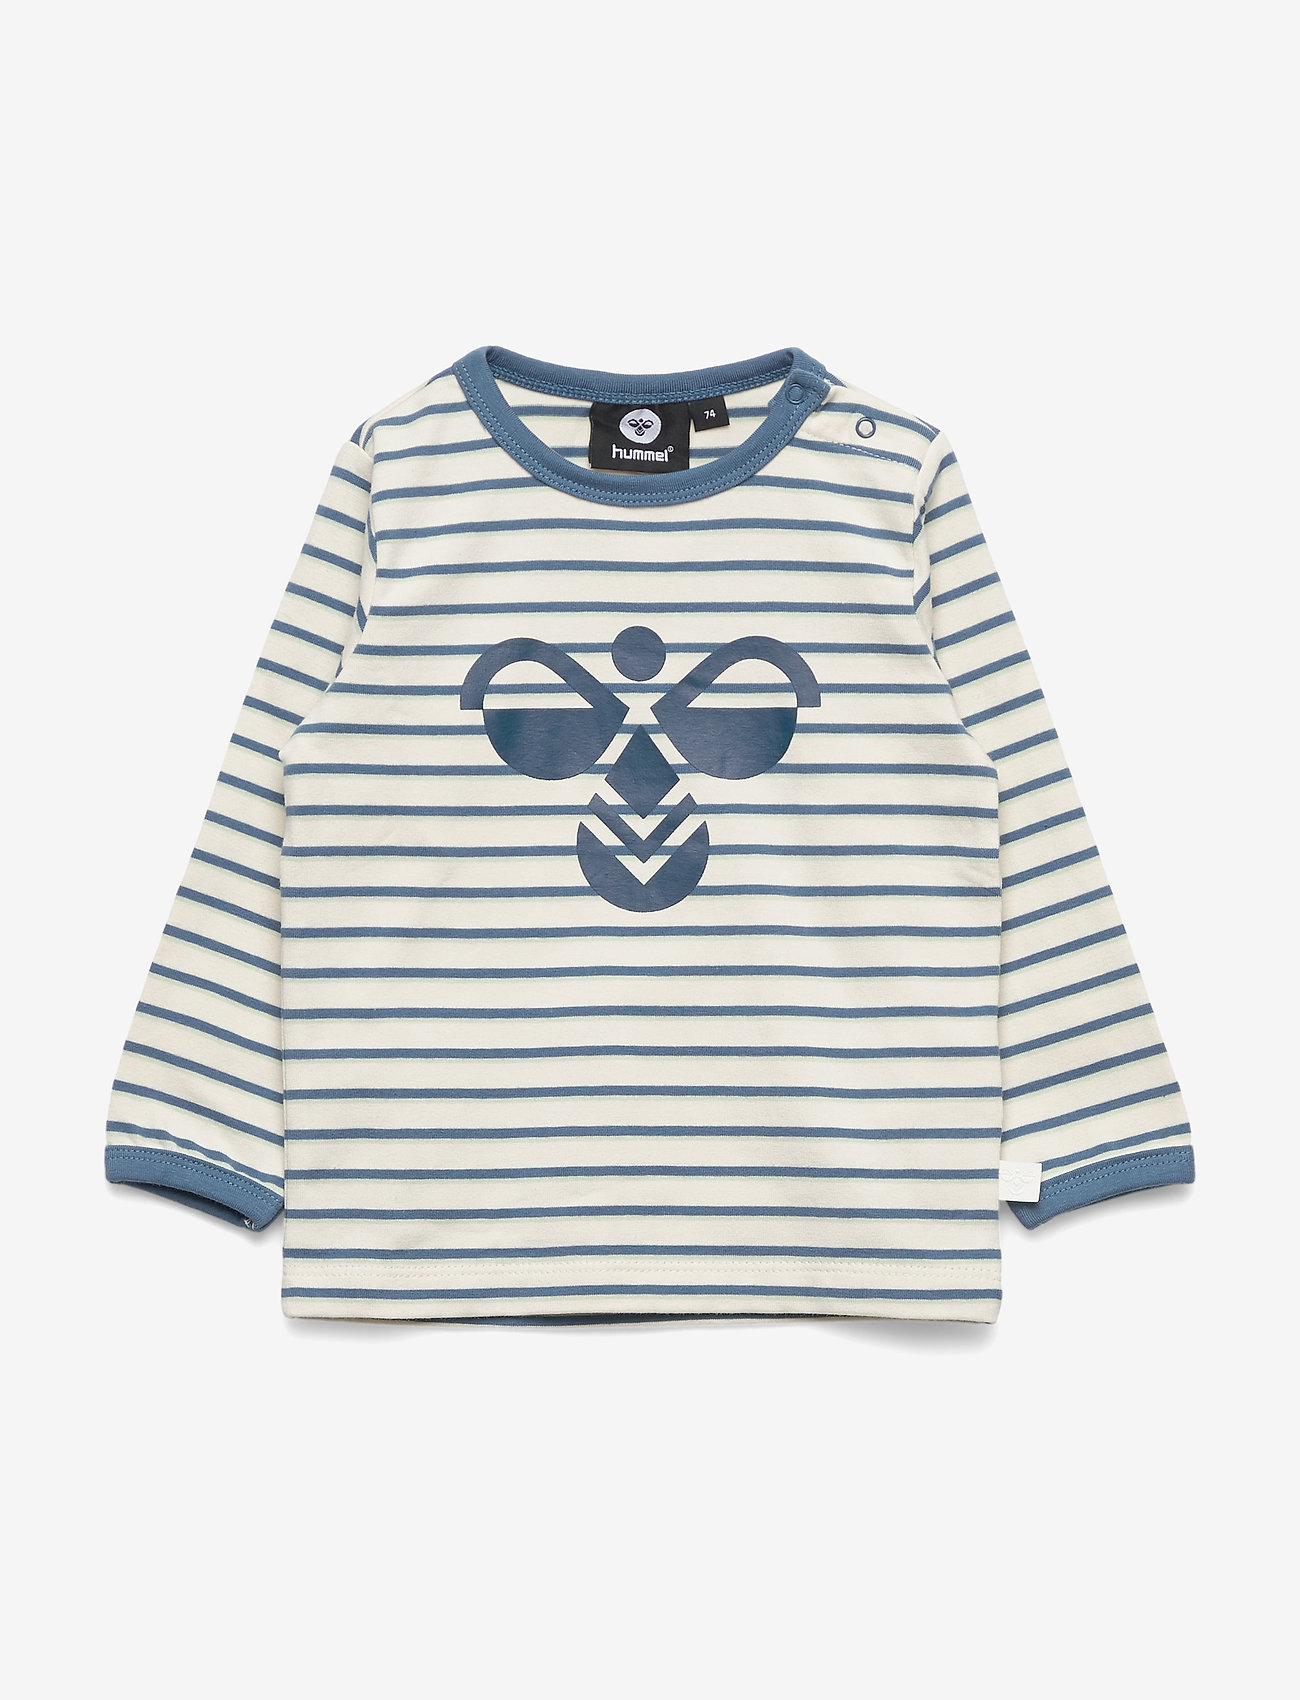 Hummel - hmlALAN T-SHIRT L/S - long-sleeved t-shirts - stellar - 0